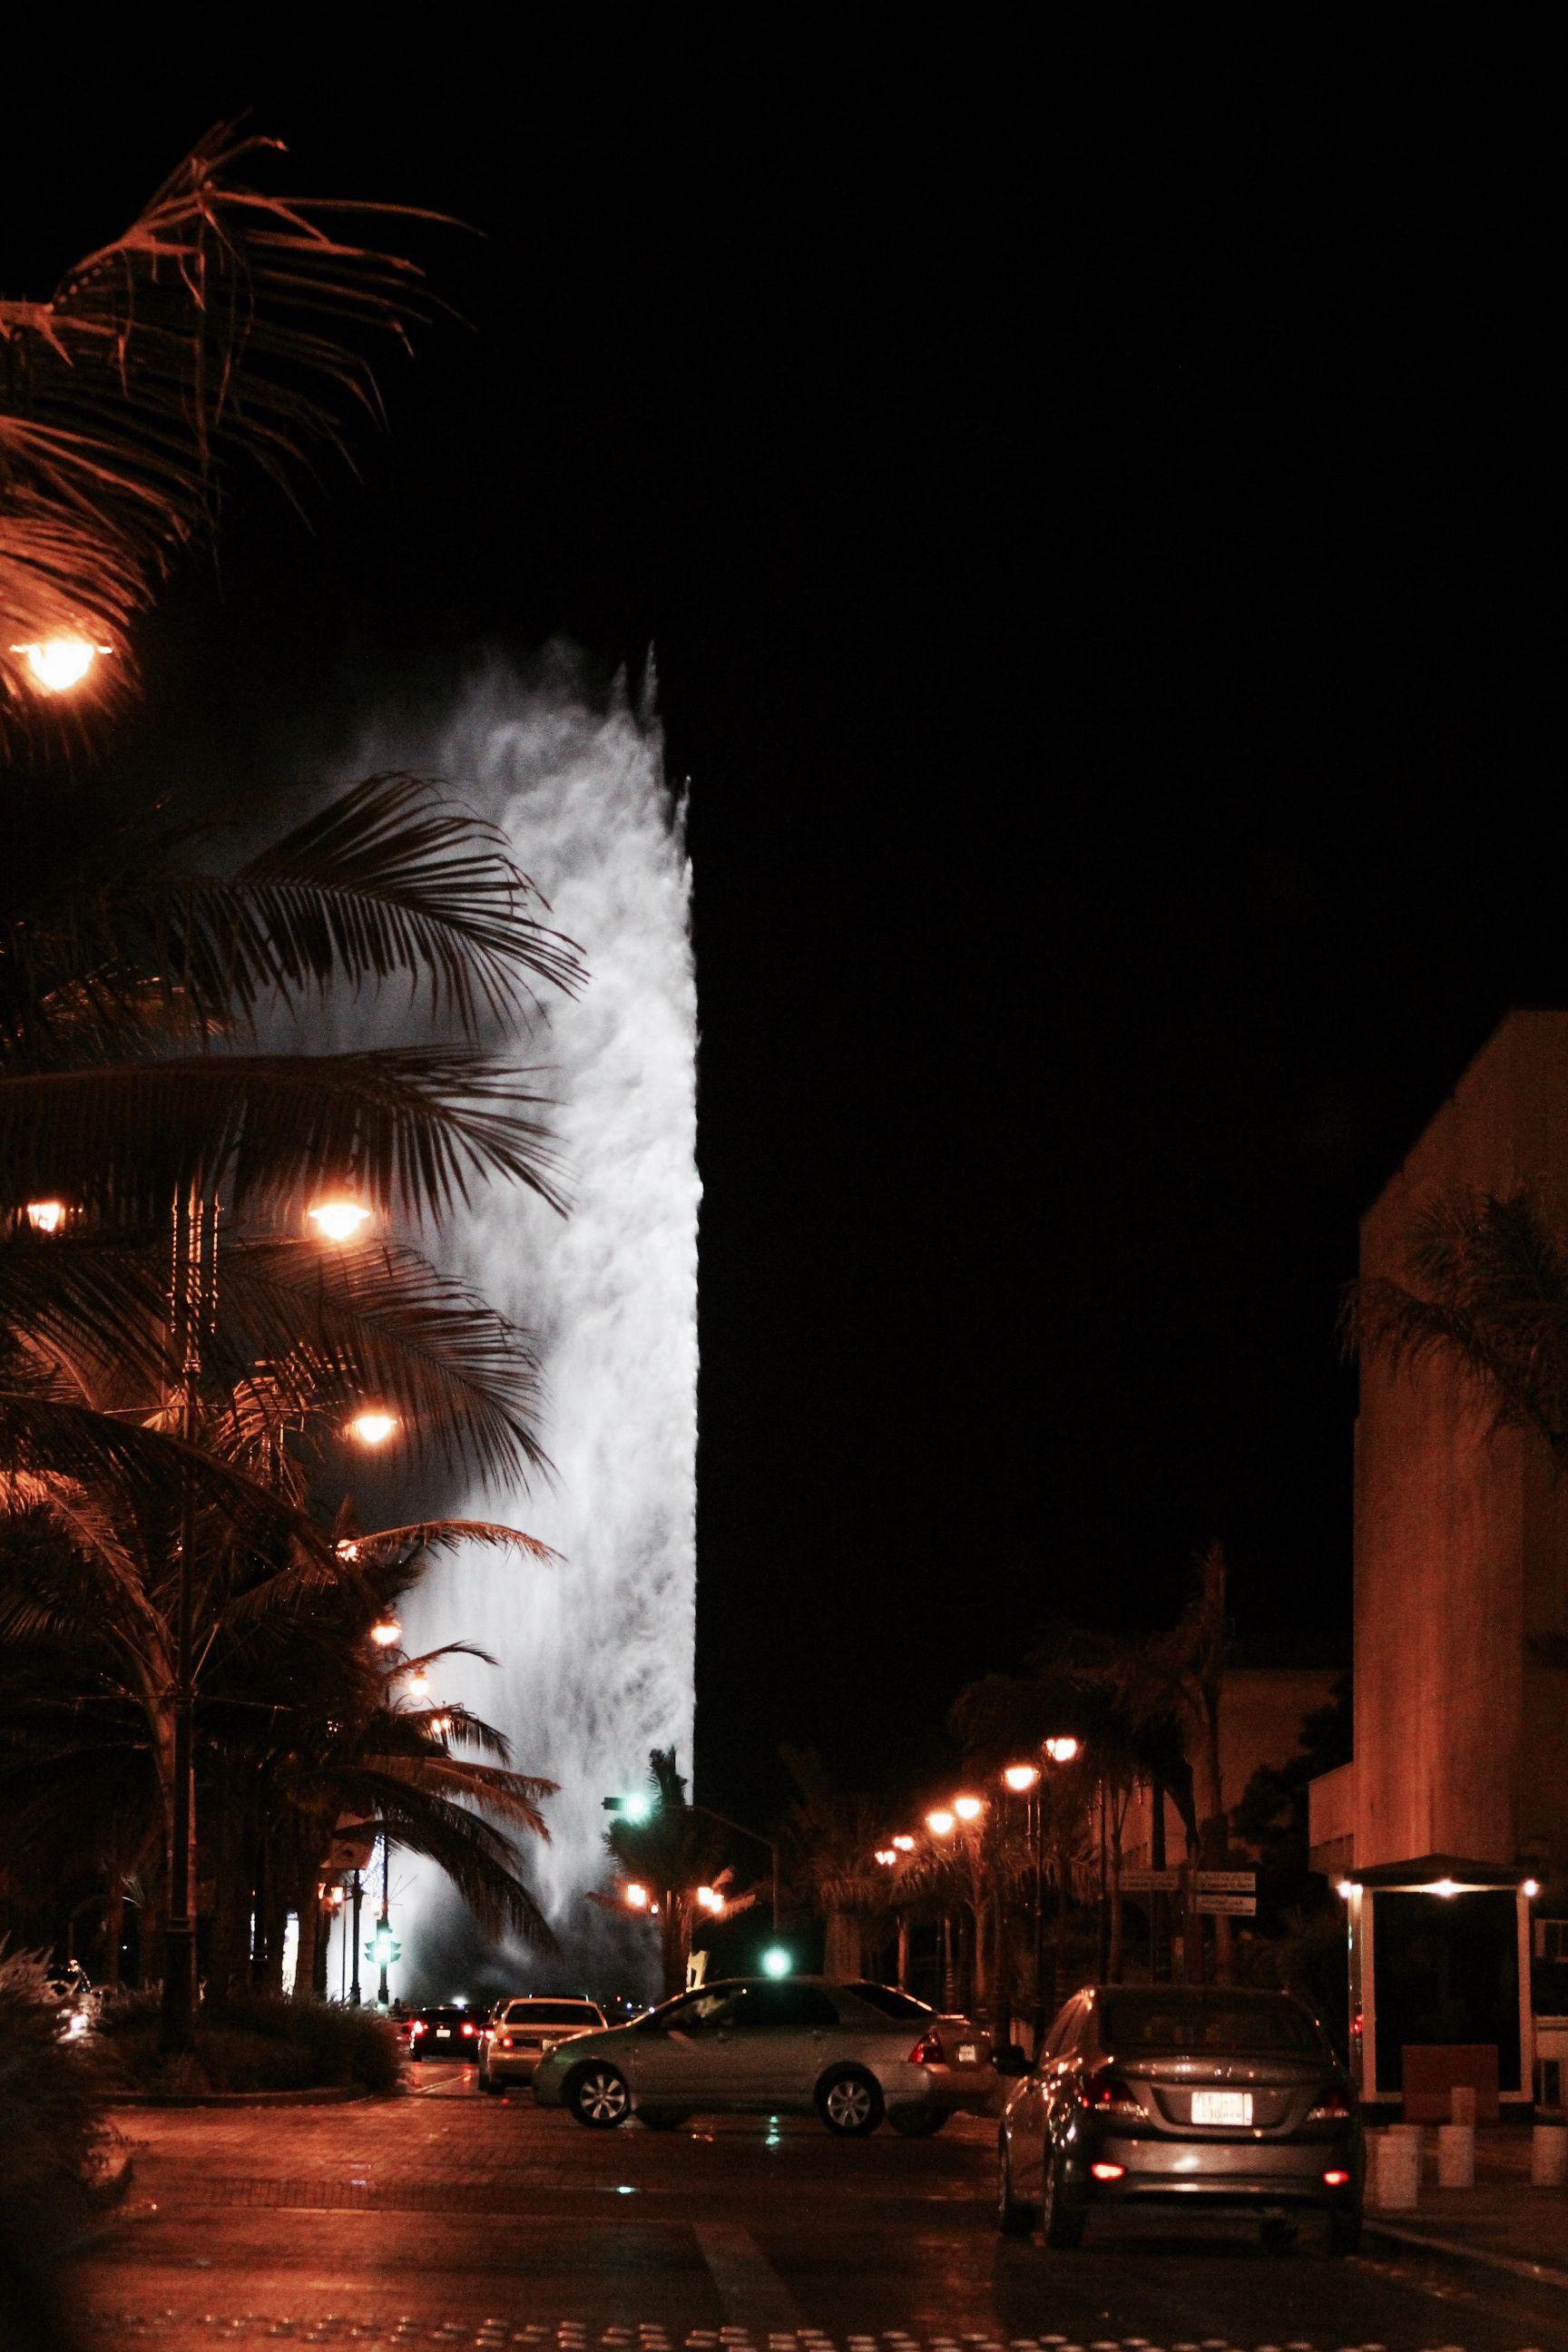 جده Jeddah Ksa Sunset City Sky Aesthetic Jeddah Saudi Arabia